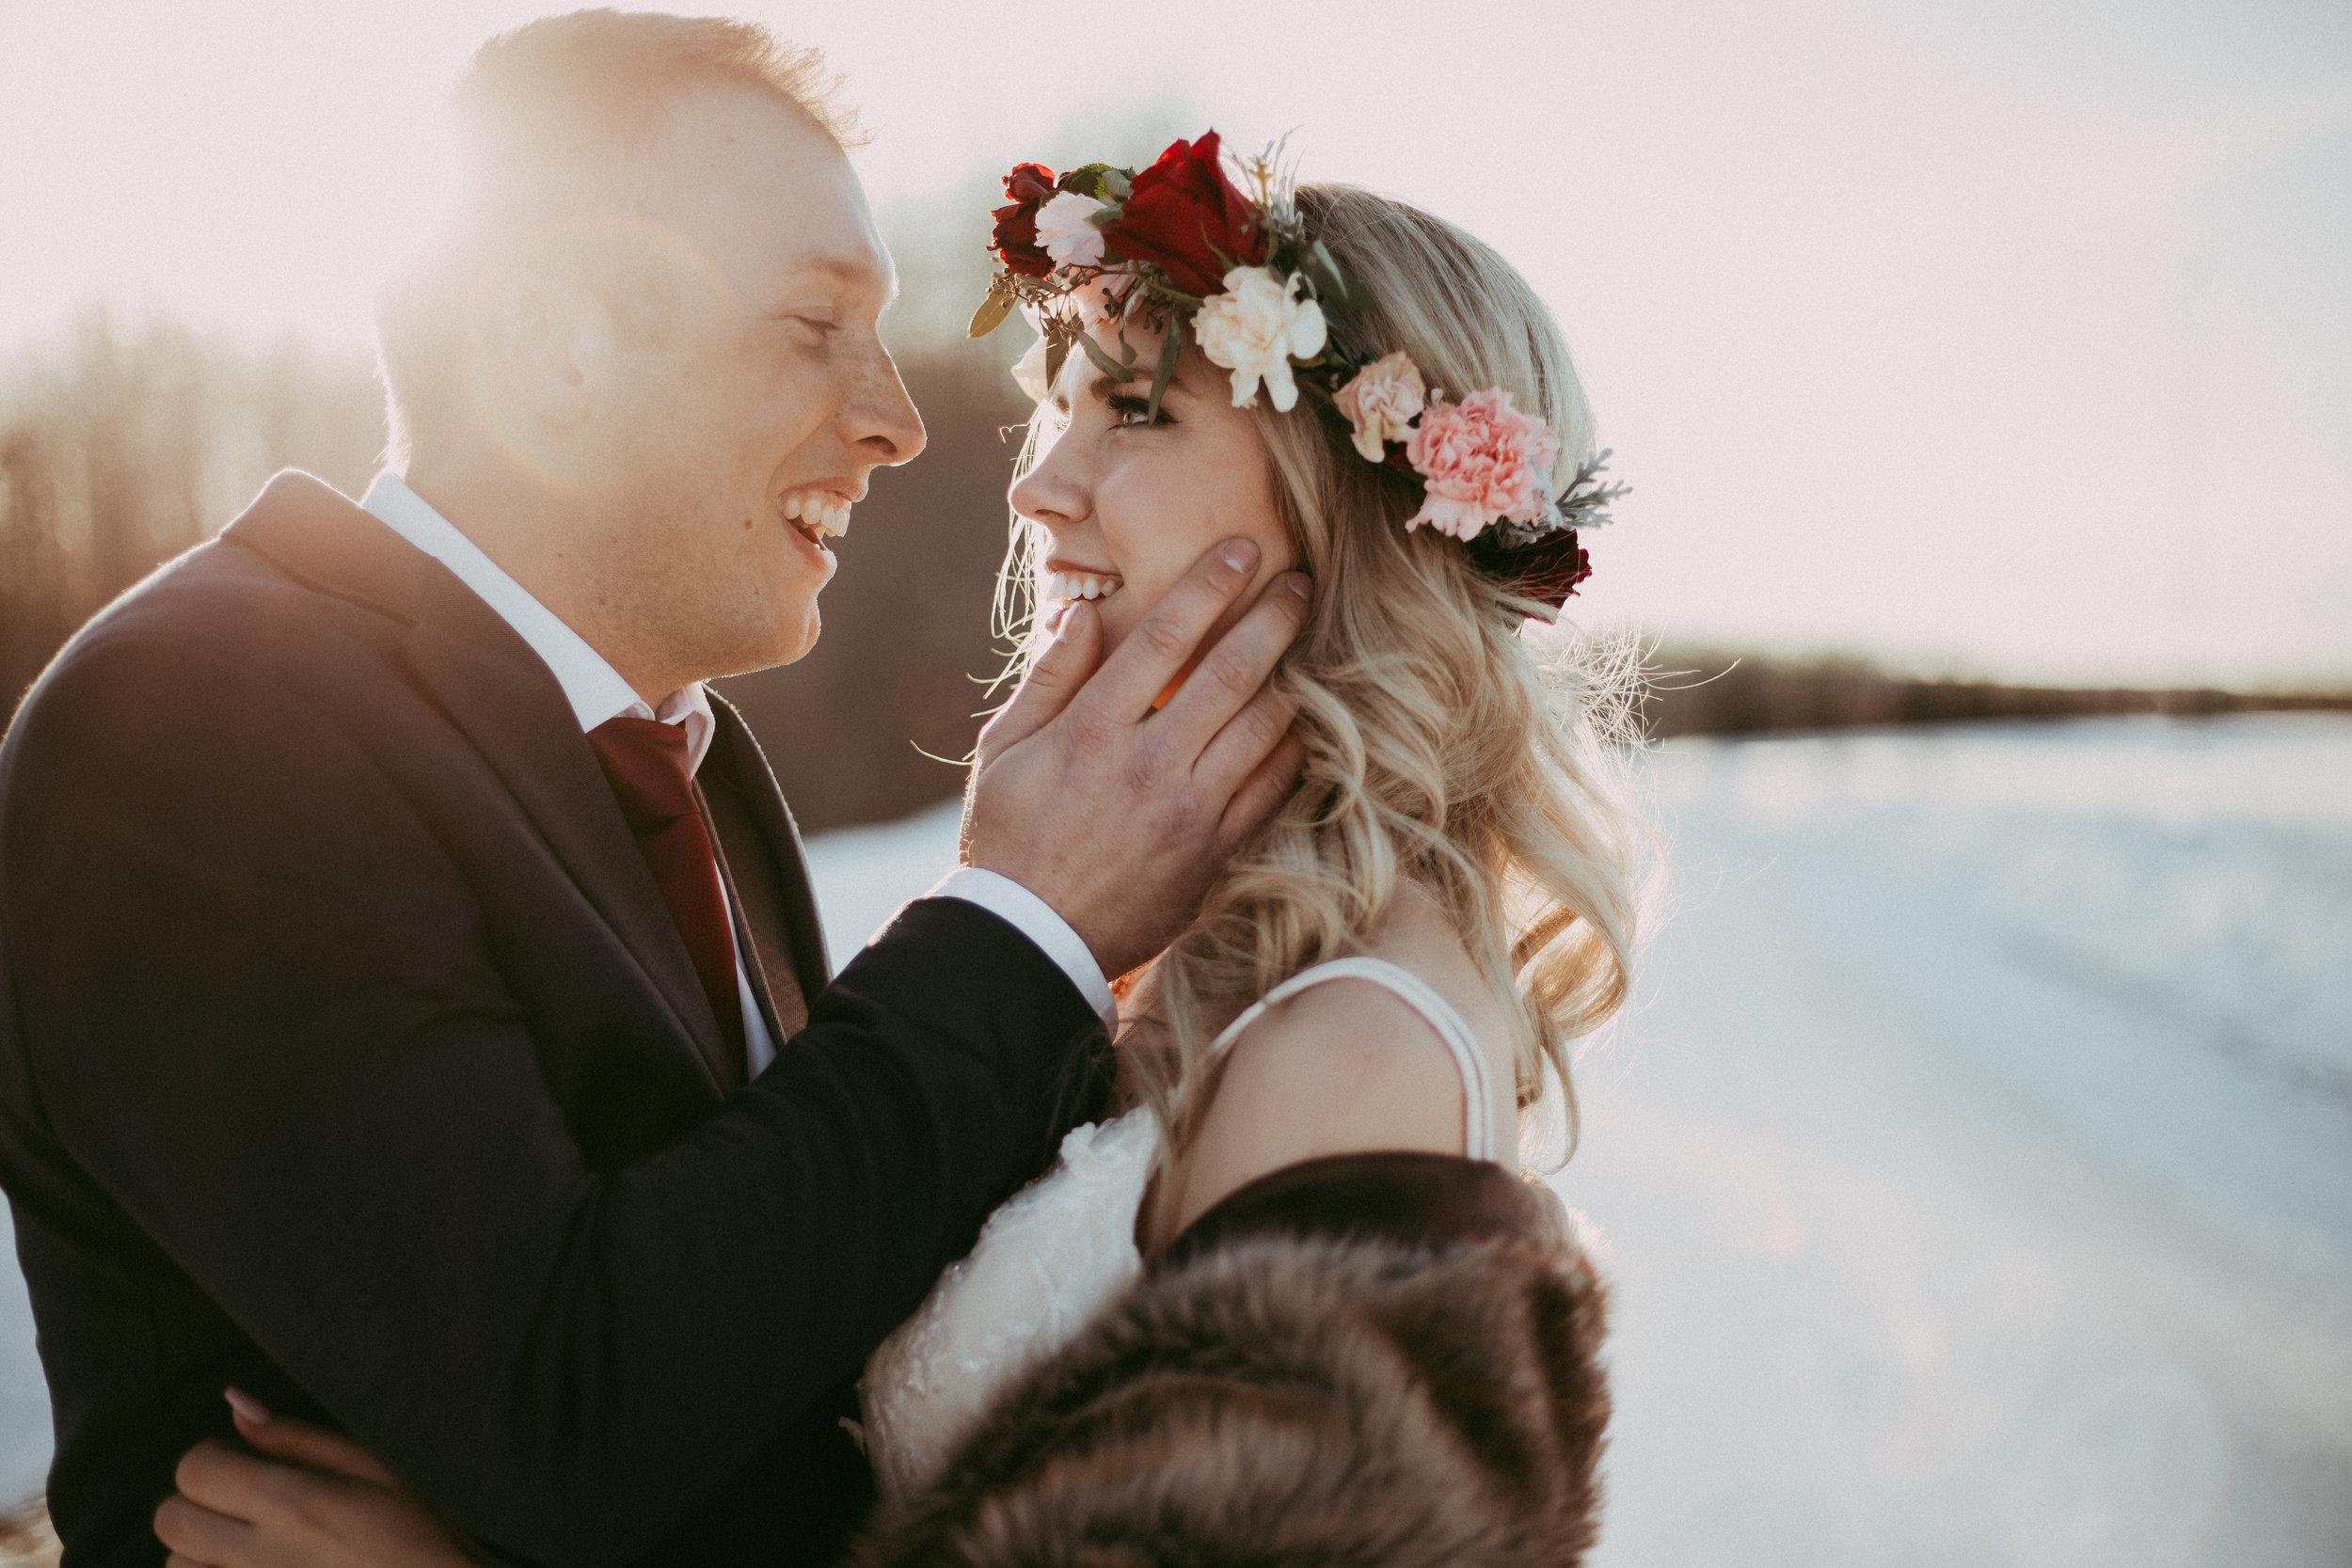 List of wedding vendors. - DJ - DJ Nightmoves 1-855-404-3283Flowers - Oriana Acres Floral Farm 250-219-7446Cake - Kosmic Krumbs 250-219-1460Decor - Rustic Rebellion Events & Rentals 250-719-6256